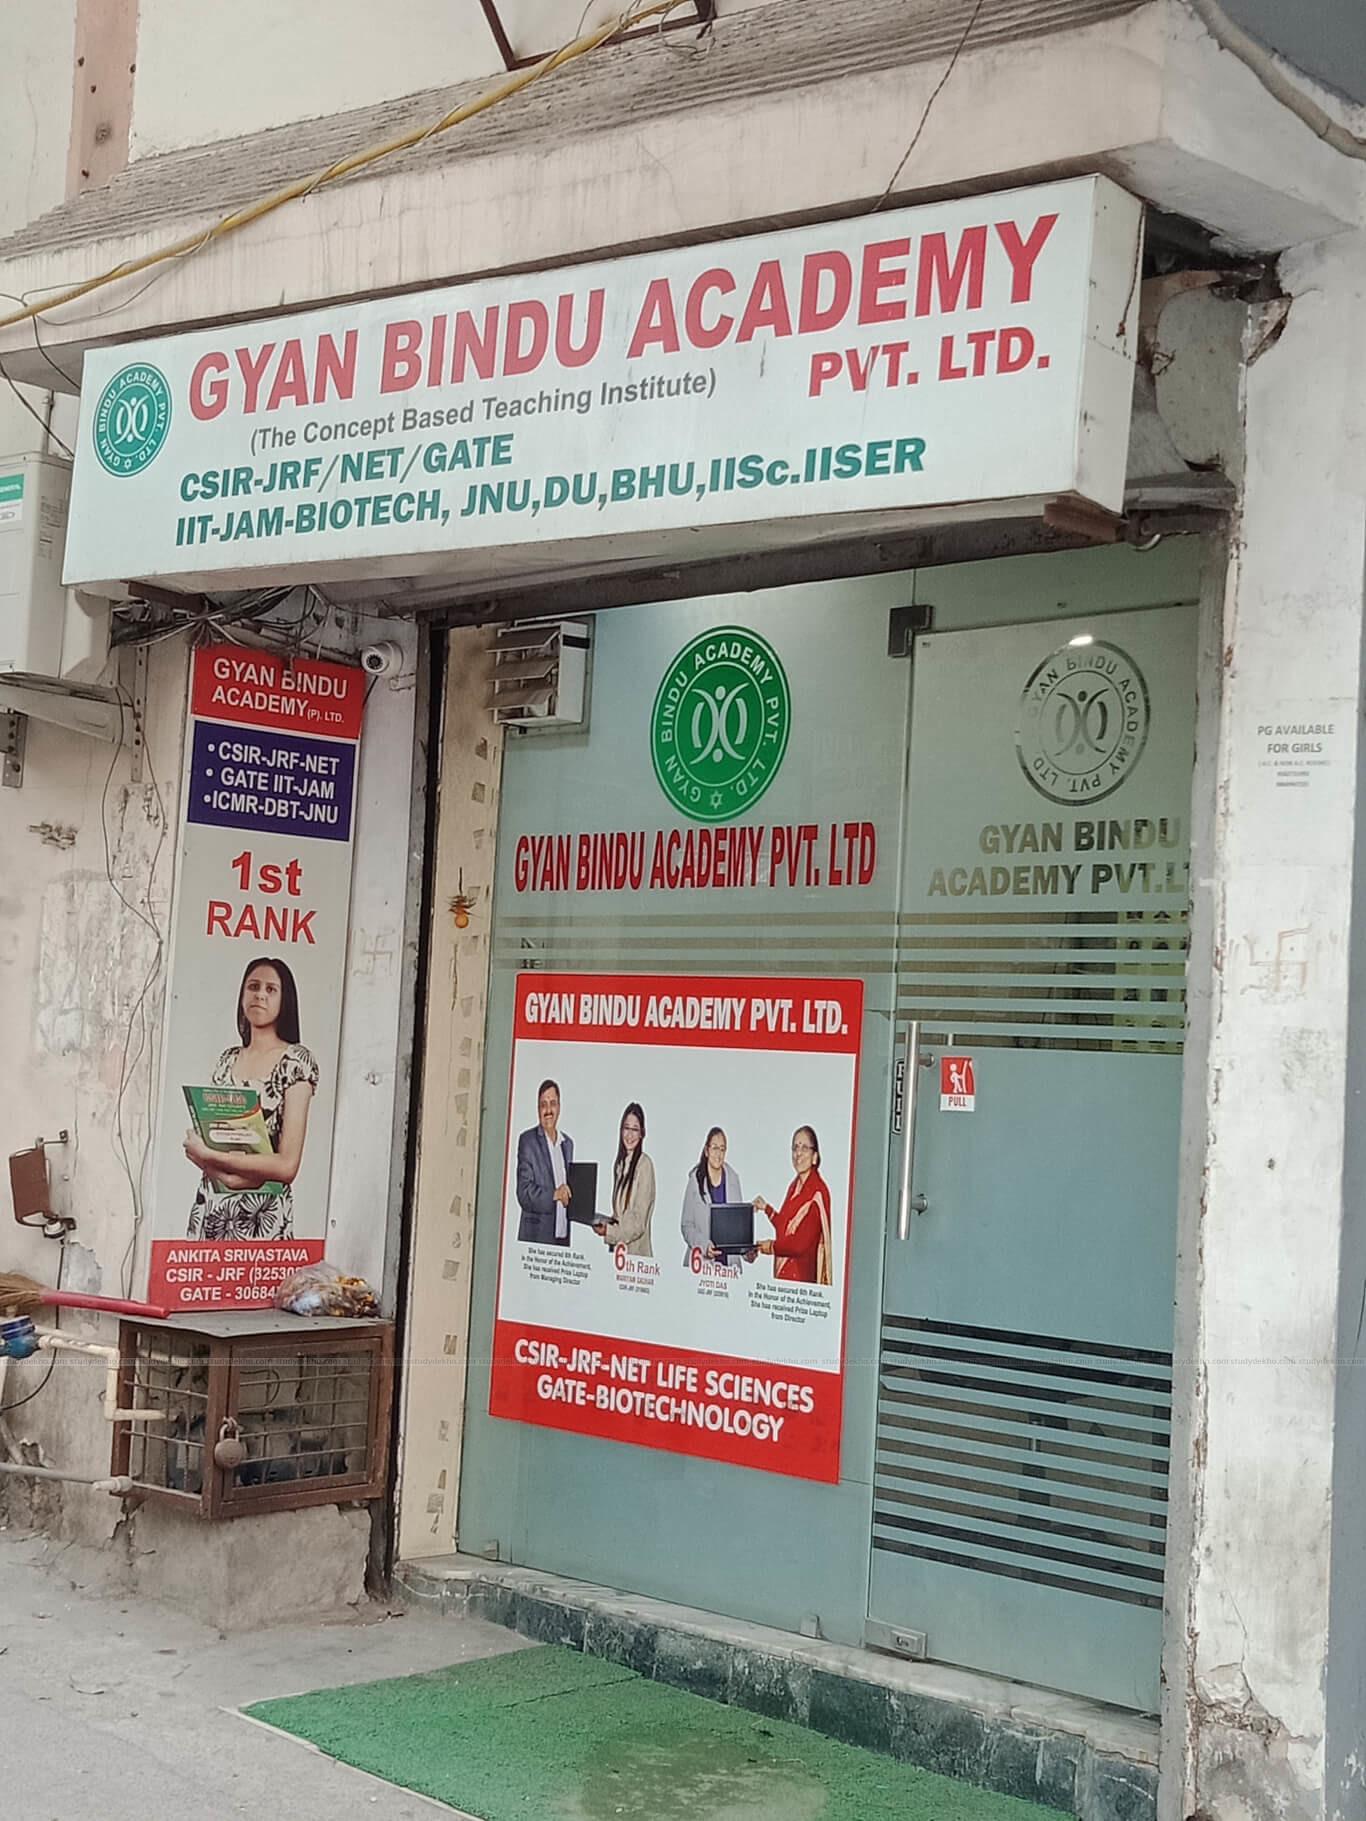 Gyan Bindu Academy Gallery